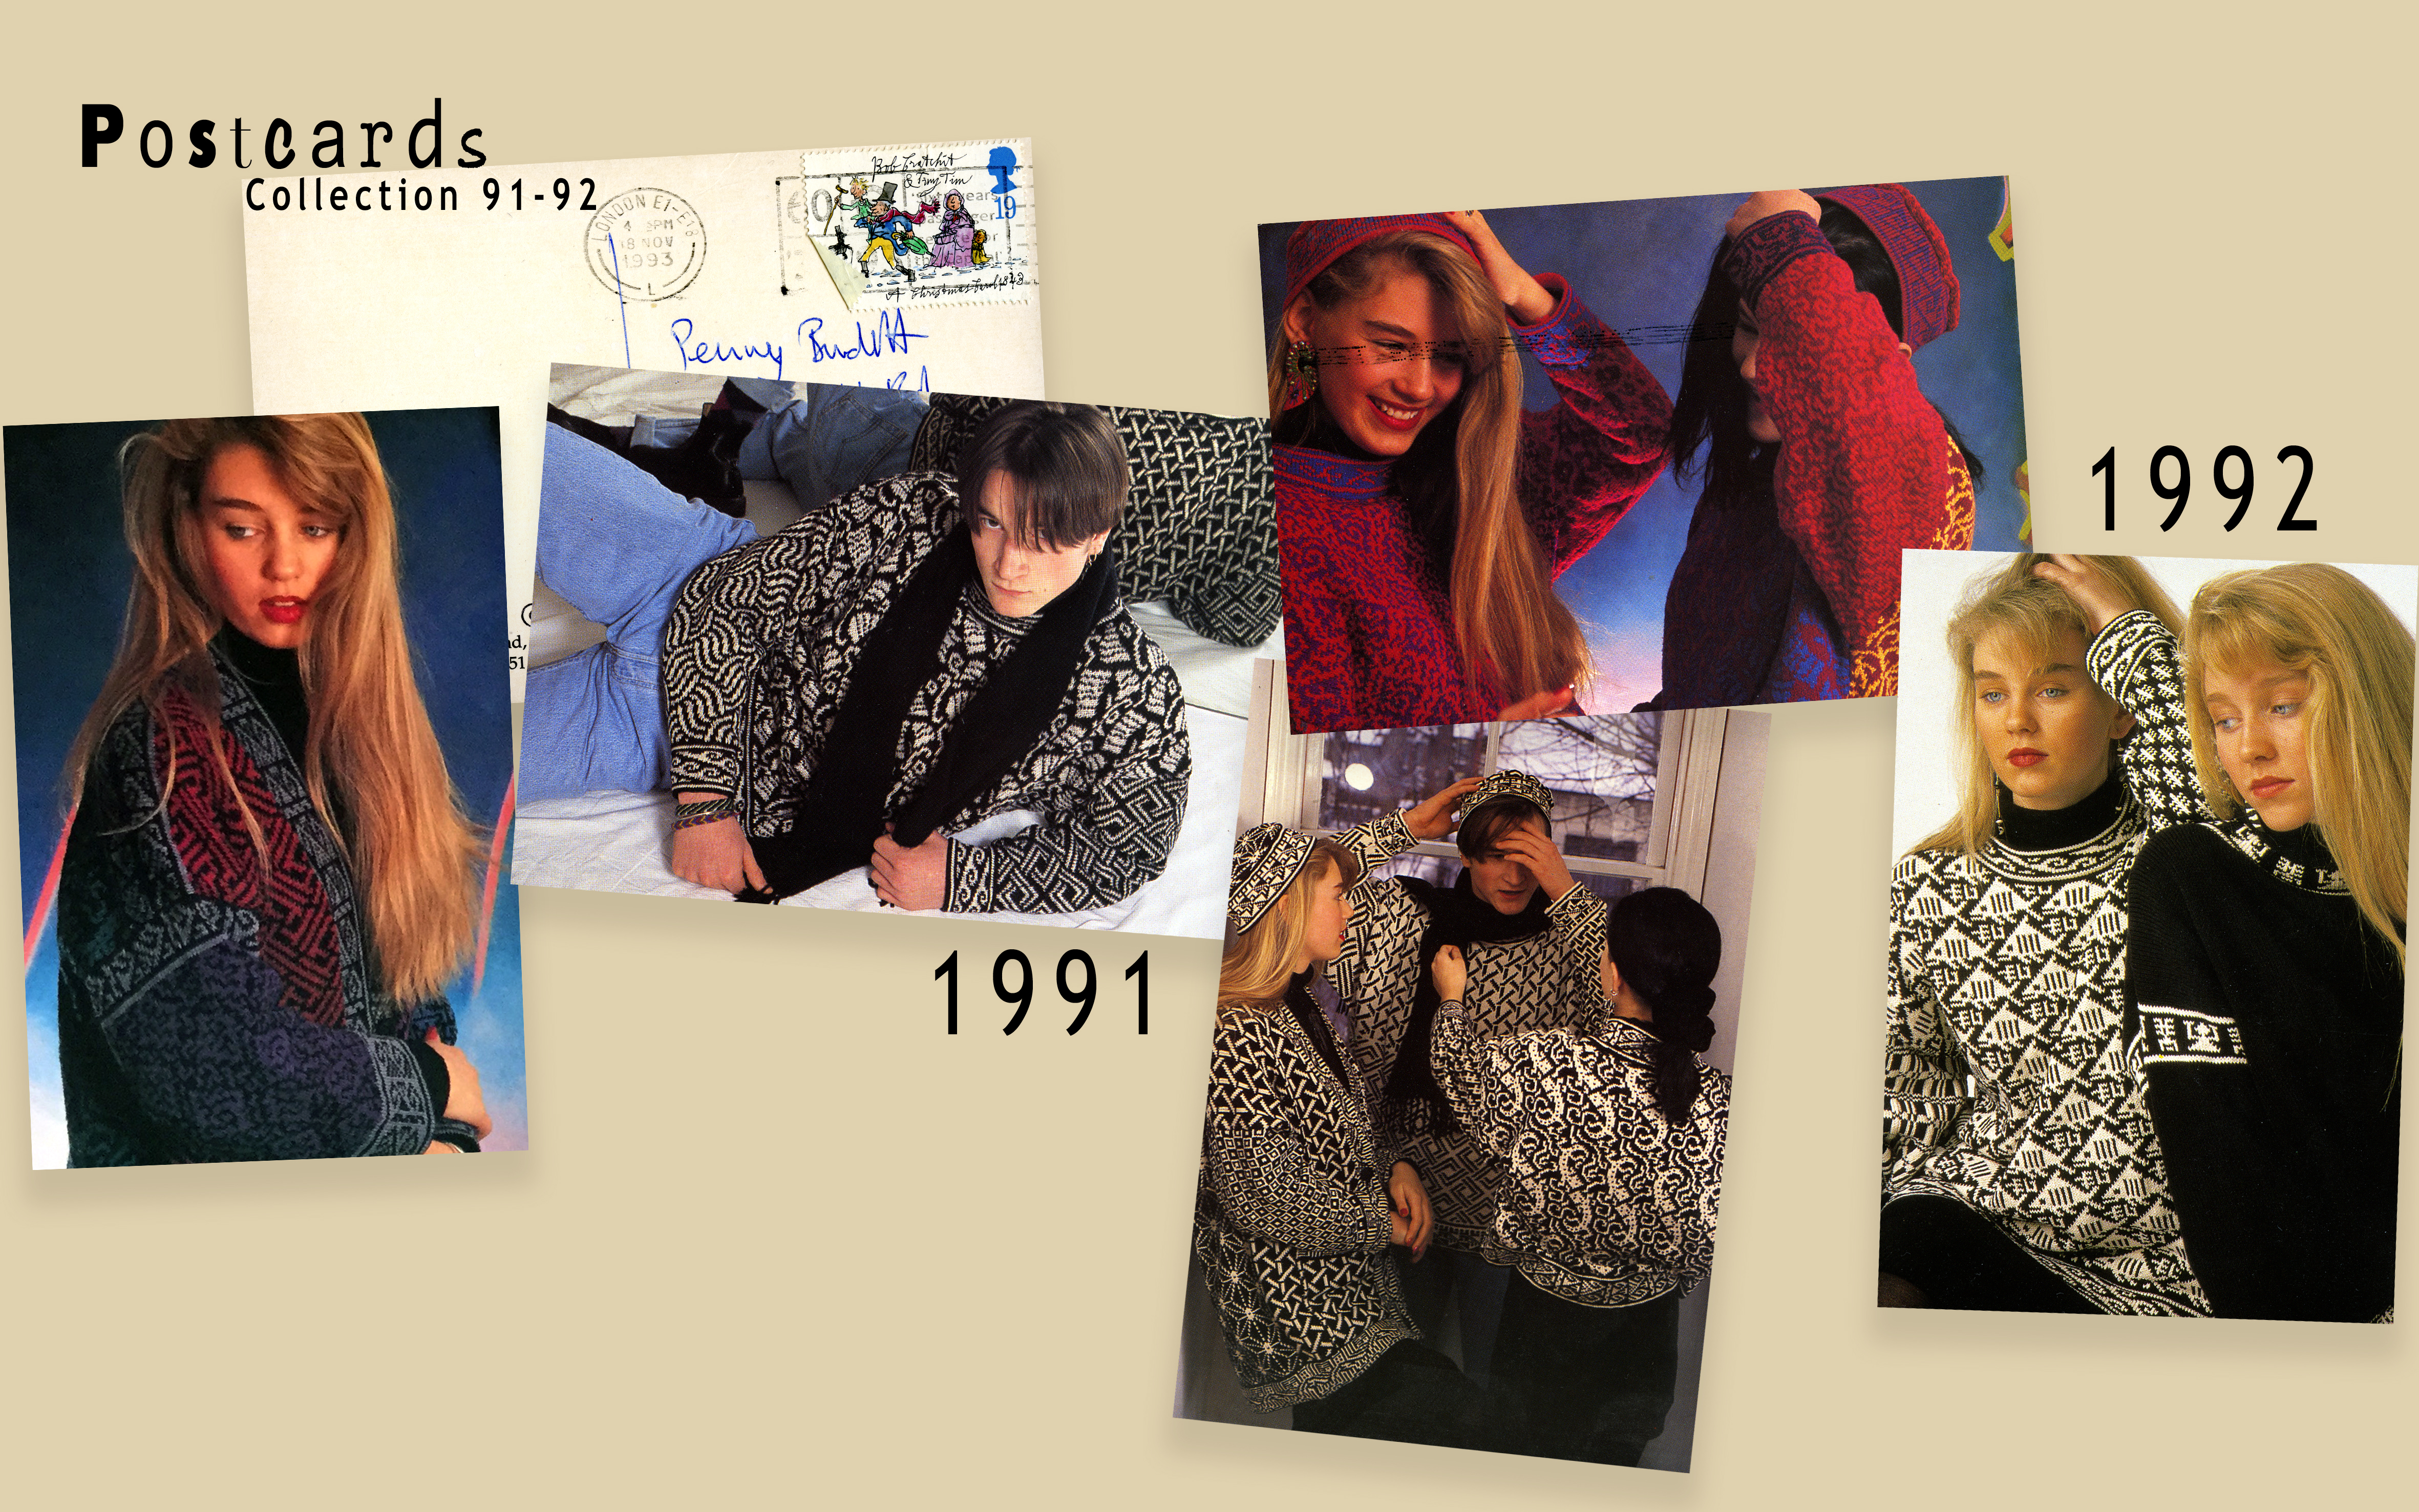 1991 -1992